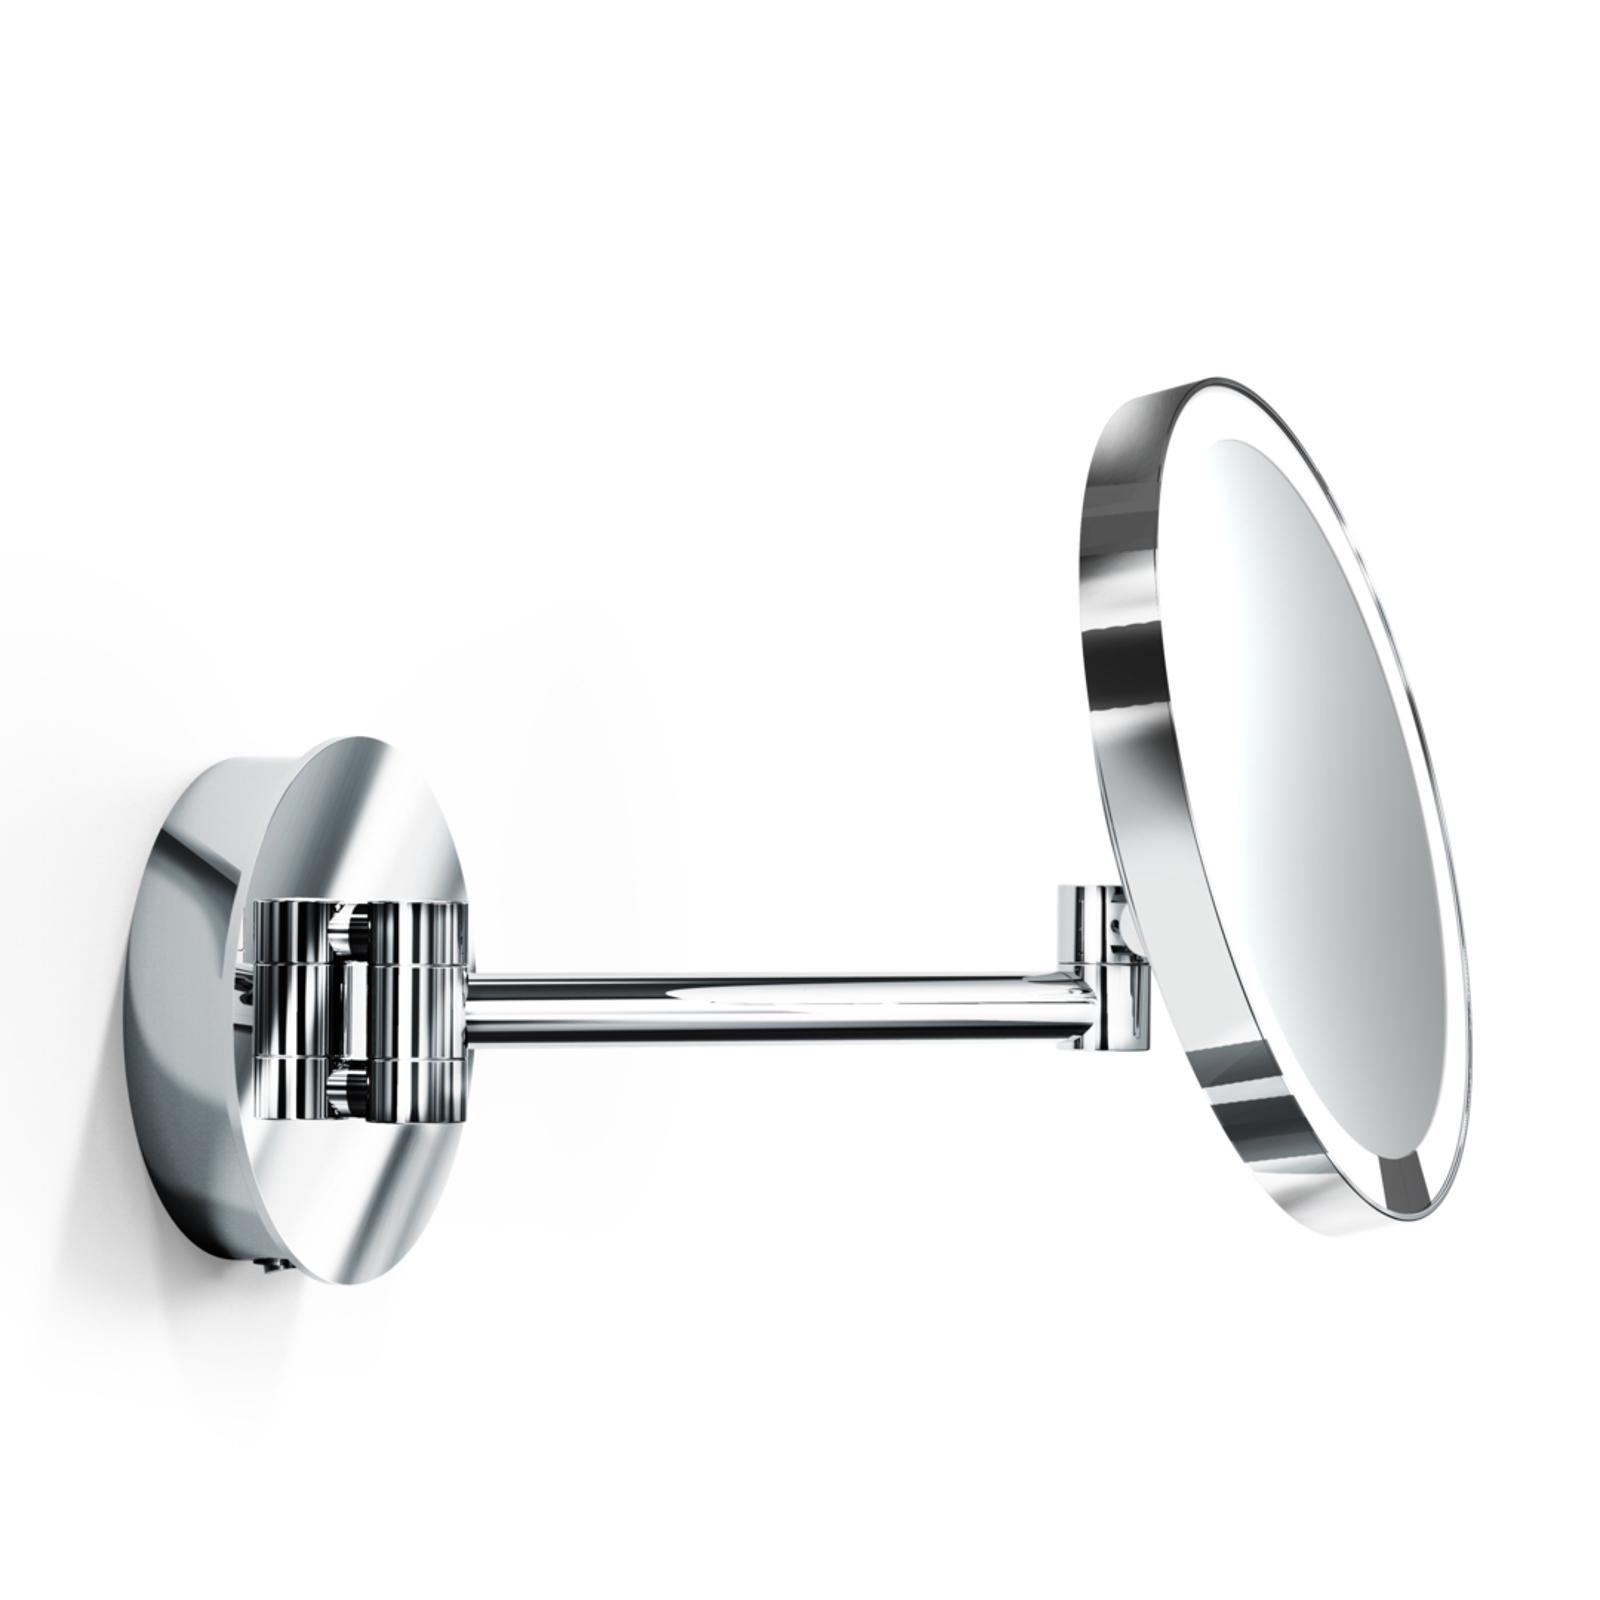 Decor Walther Just Look WD LED-vægspejl, krom